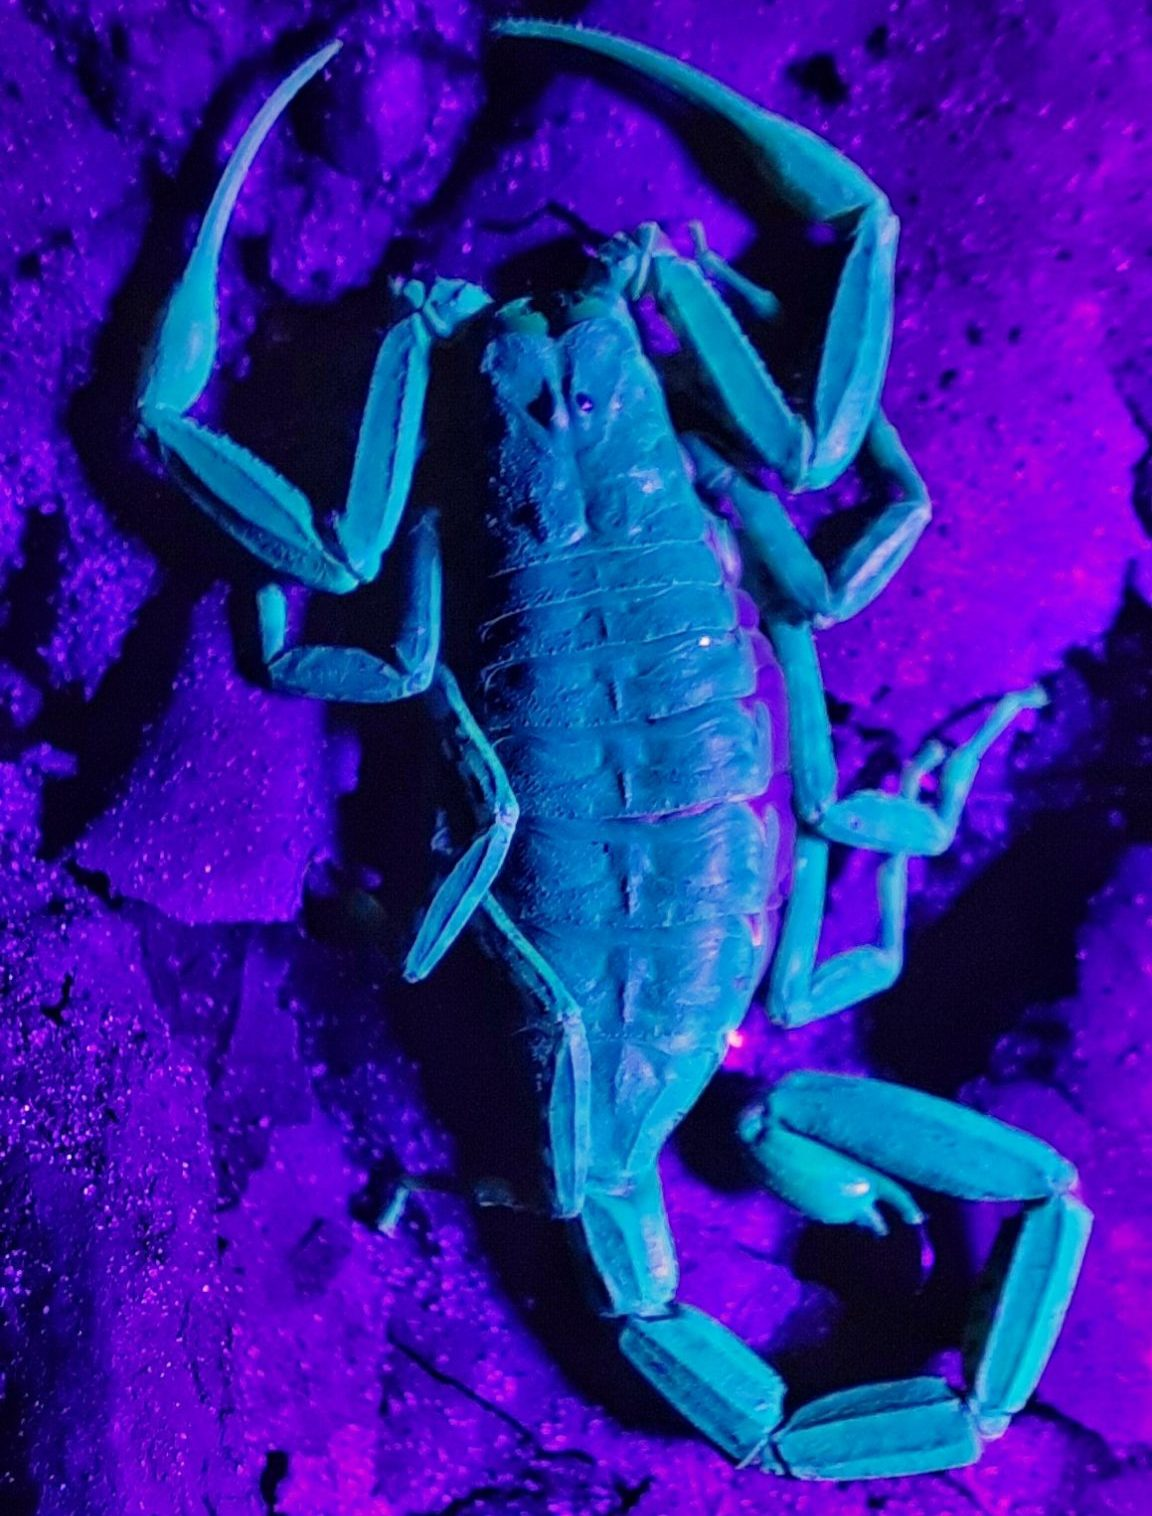 A scorpion belonging to the Isometrus species. Photo credit Shubhankar Deshpande